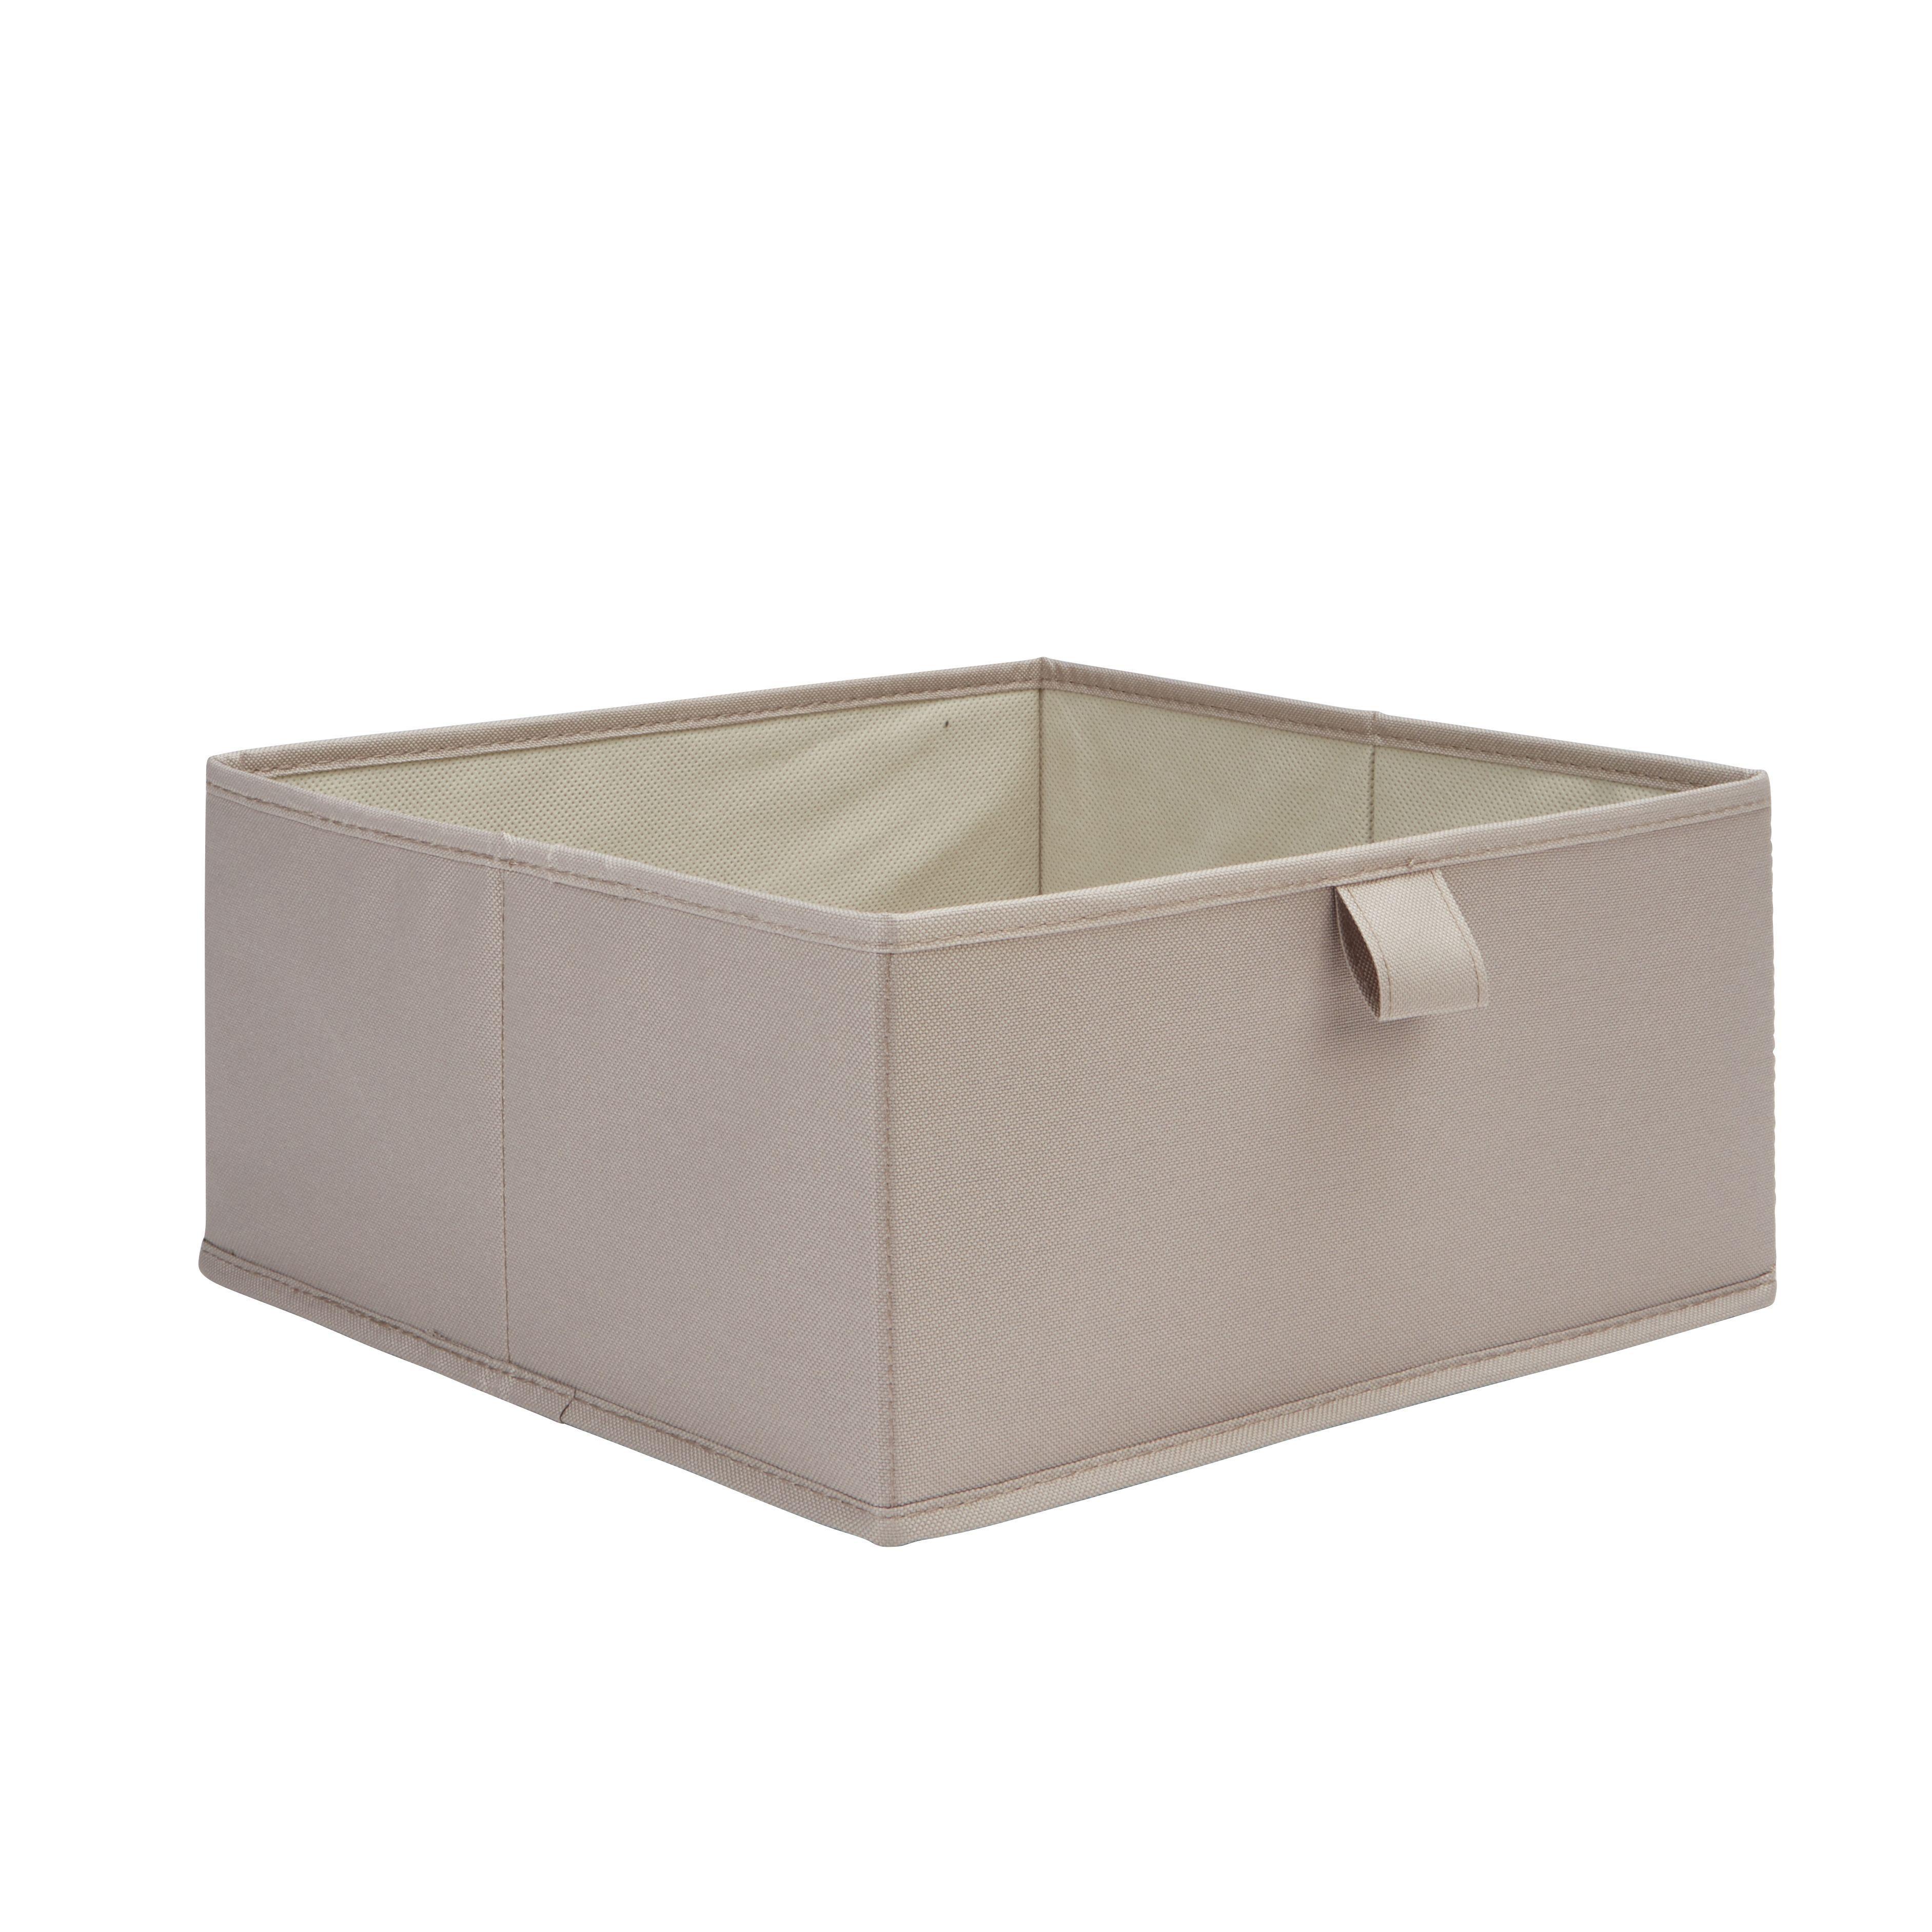 Form Mixxit Taupe Half Height Storage Box (w)310mm